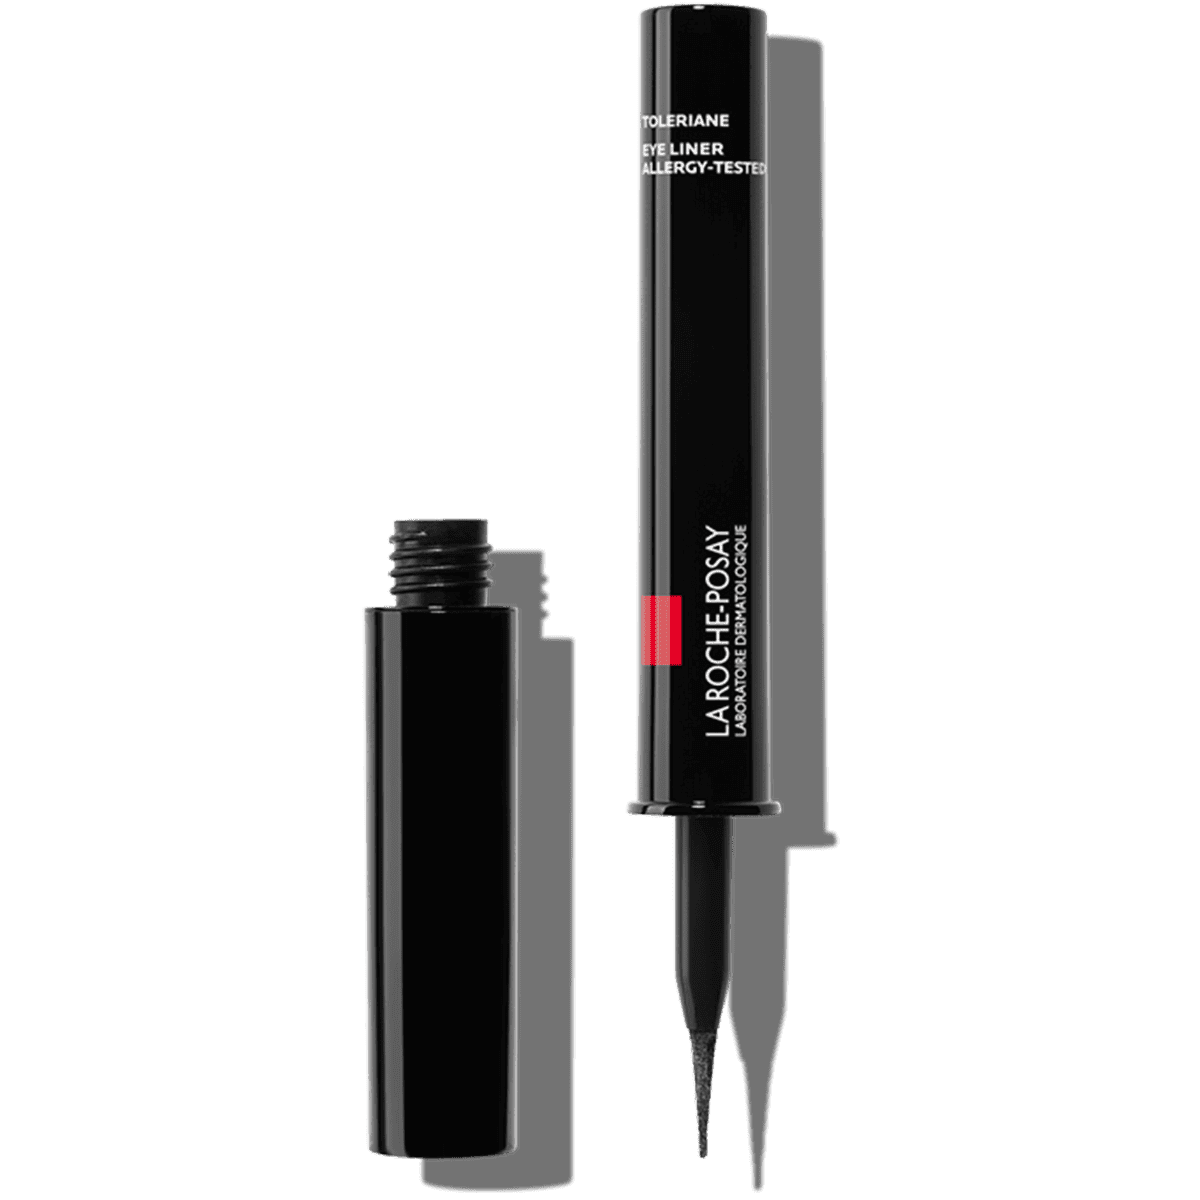 La Roche Posay Sensitive Toleriane Make up EYELINER_Black 343342240304